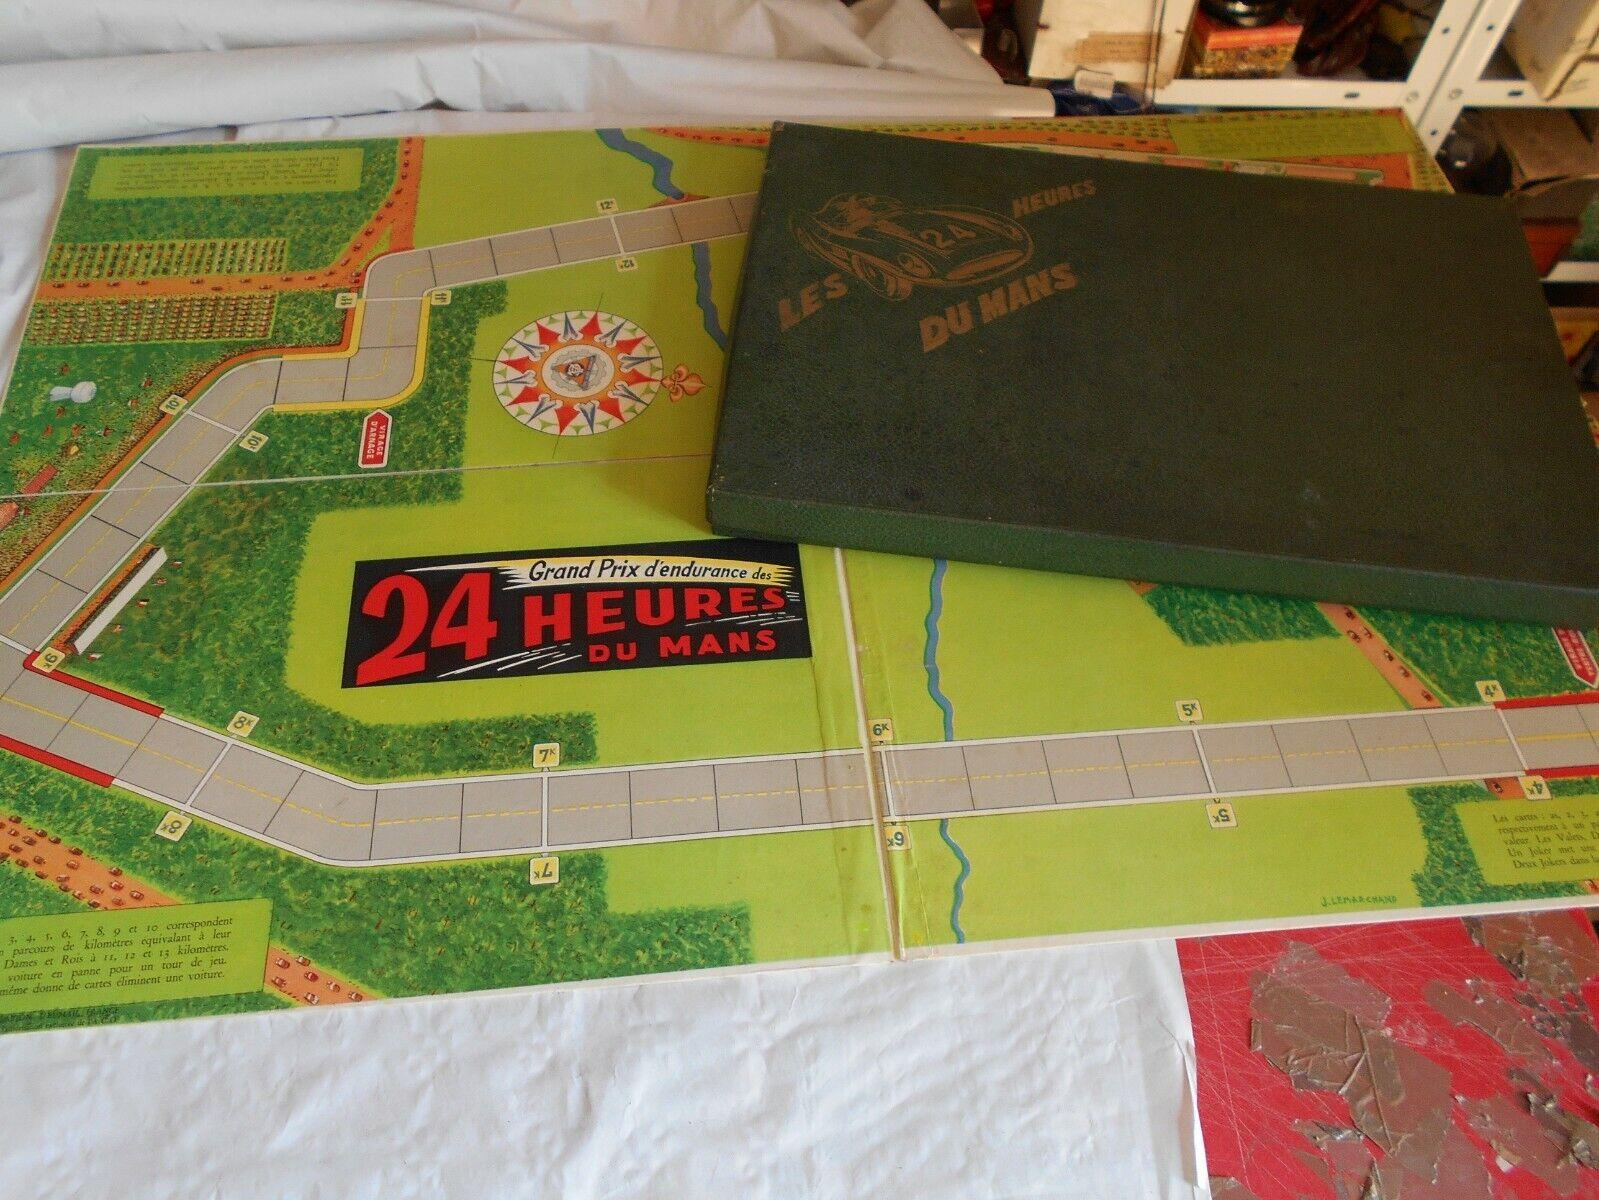 Vintage game Les 25 heures Du Mans 1950s Le Mans racing game french